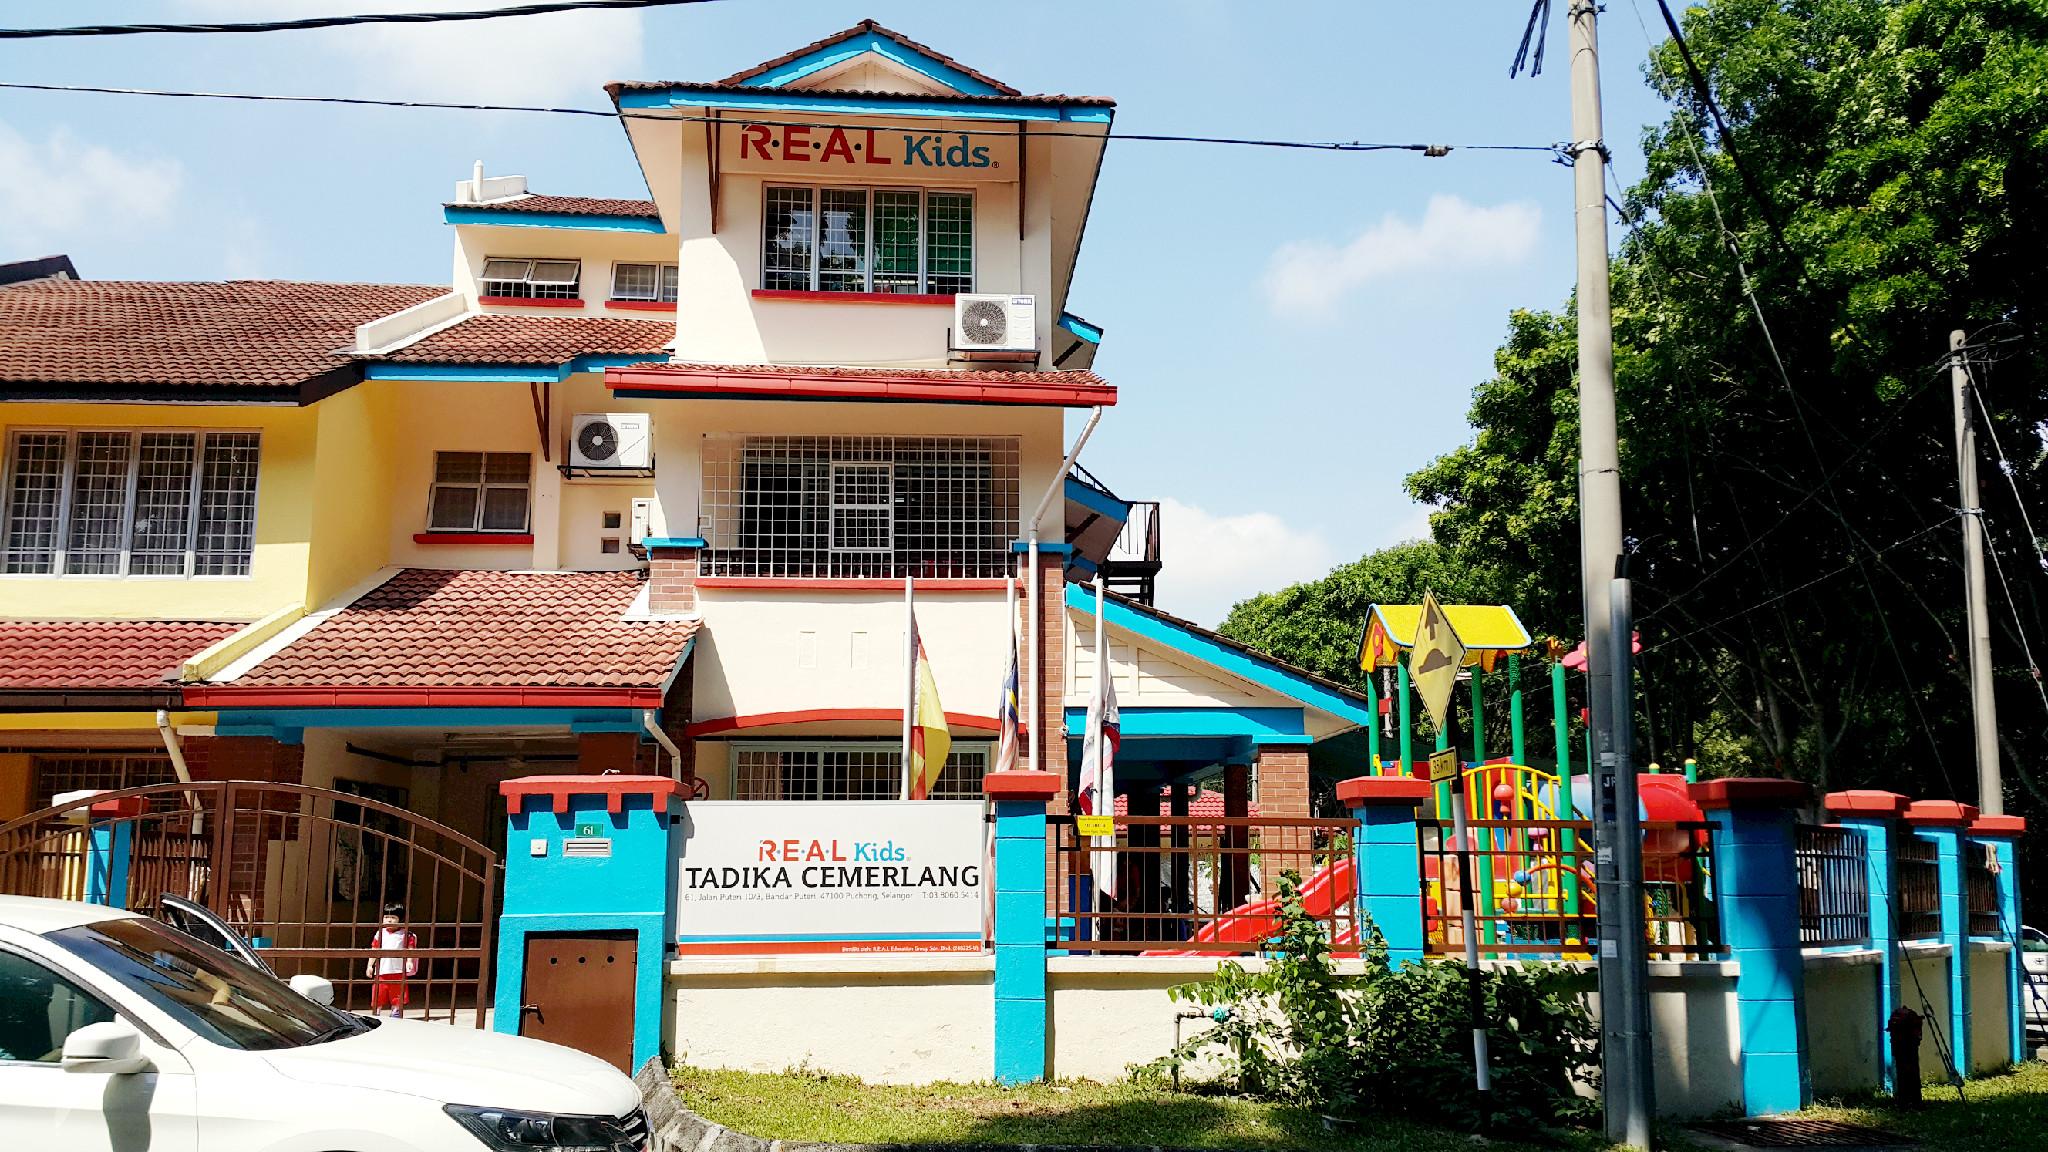 REAL Kids Bandar Puteri Puchong